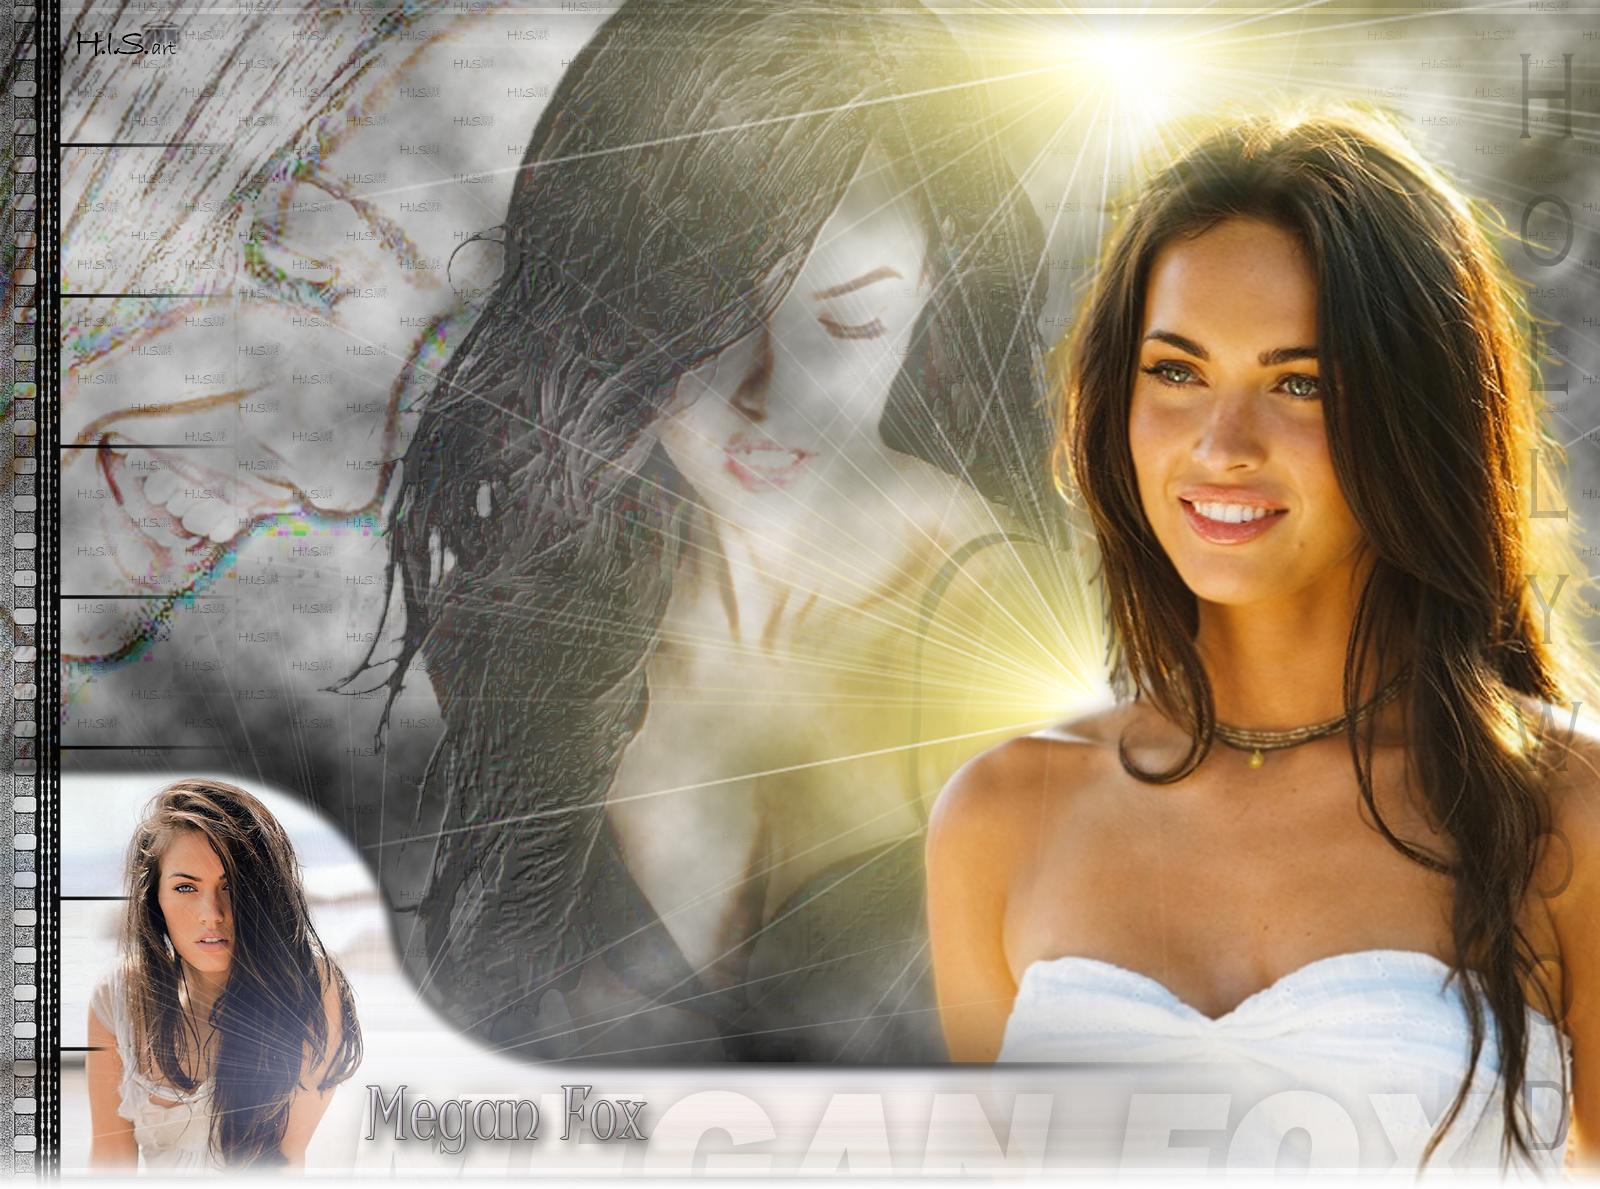 http://2.bp.blogspot.com/-h0jMVTGG1CY/ThH_fKLsqLI/AAAAAAAAAB4/WPfBuHVPKkg/s1600/Megan-Fox-super-Wallpapers-2.jpg